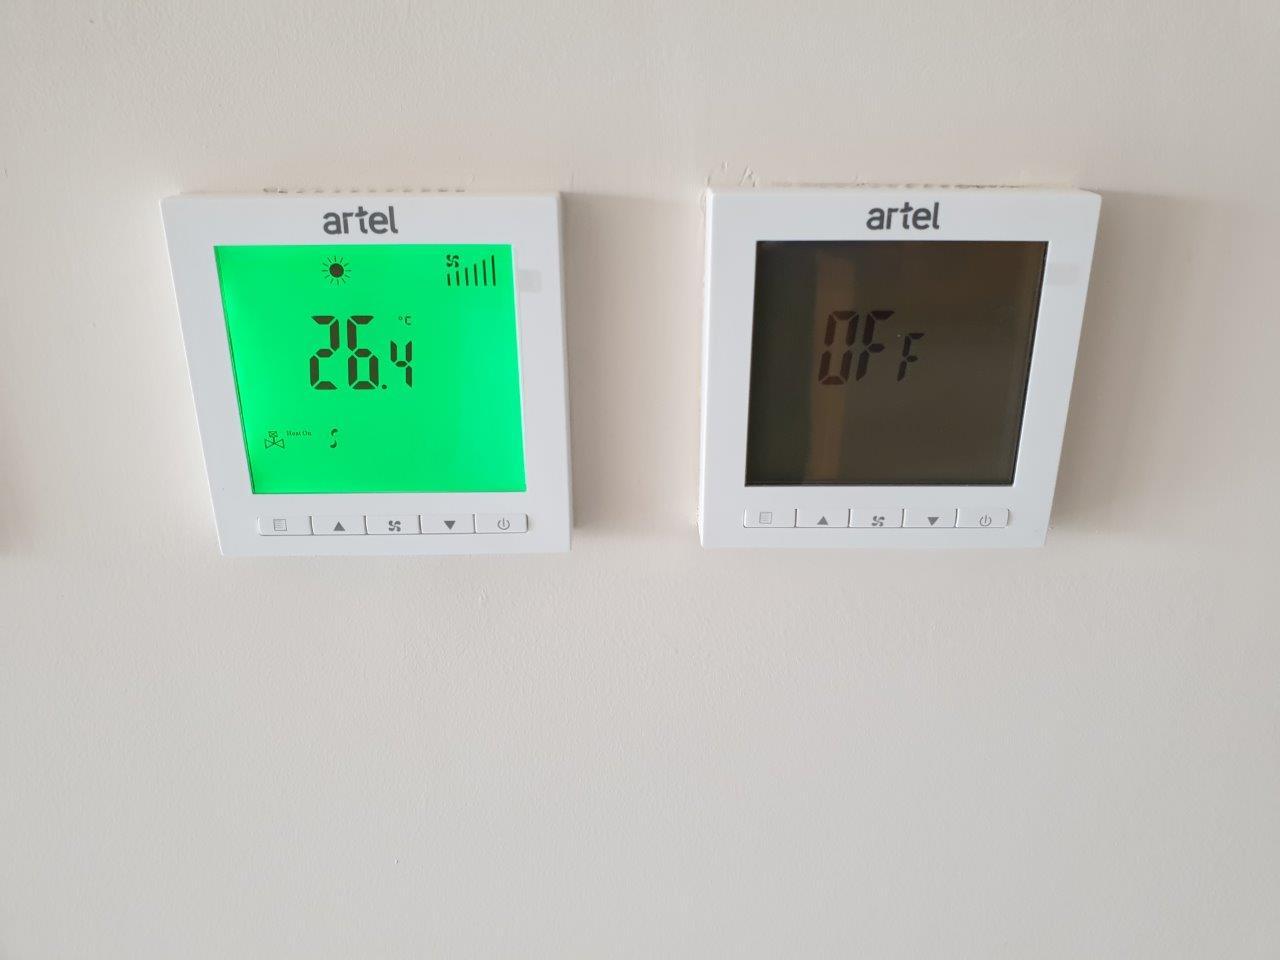 artel-termostat